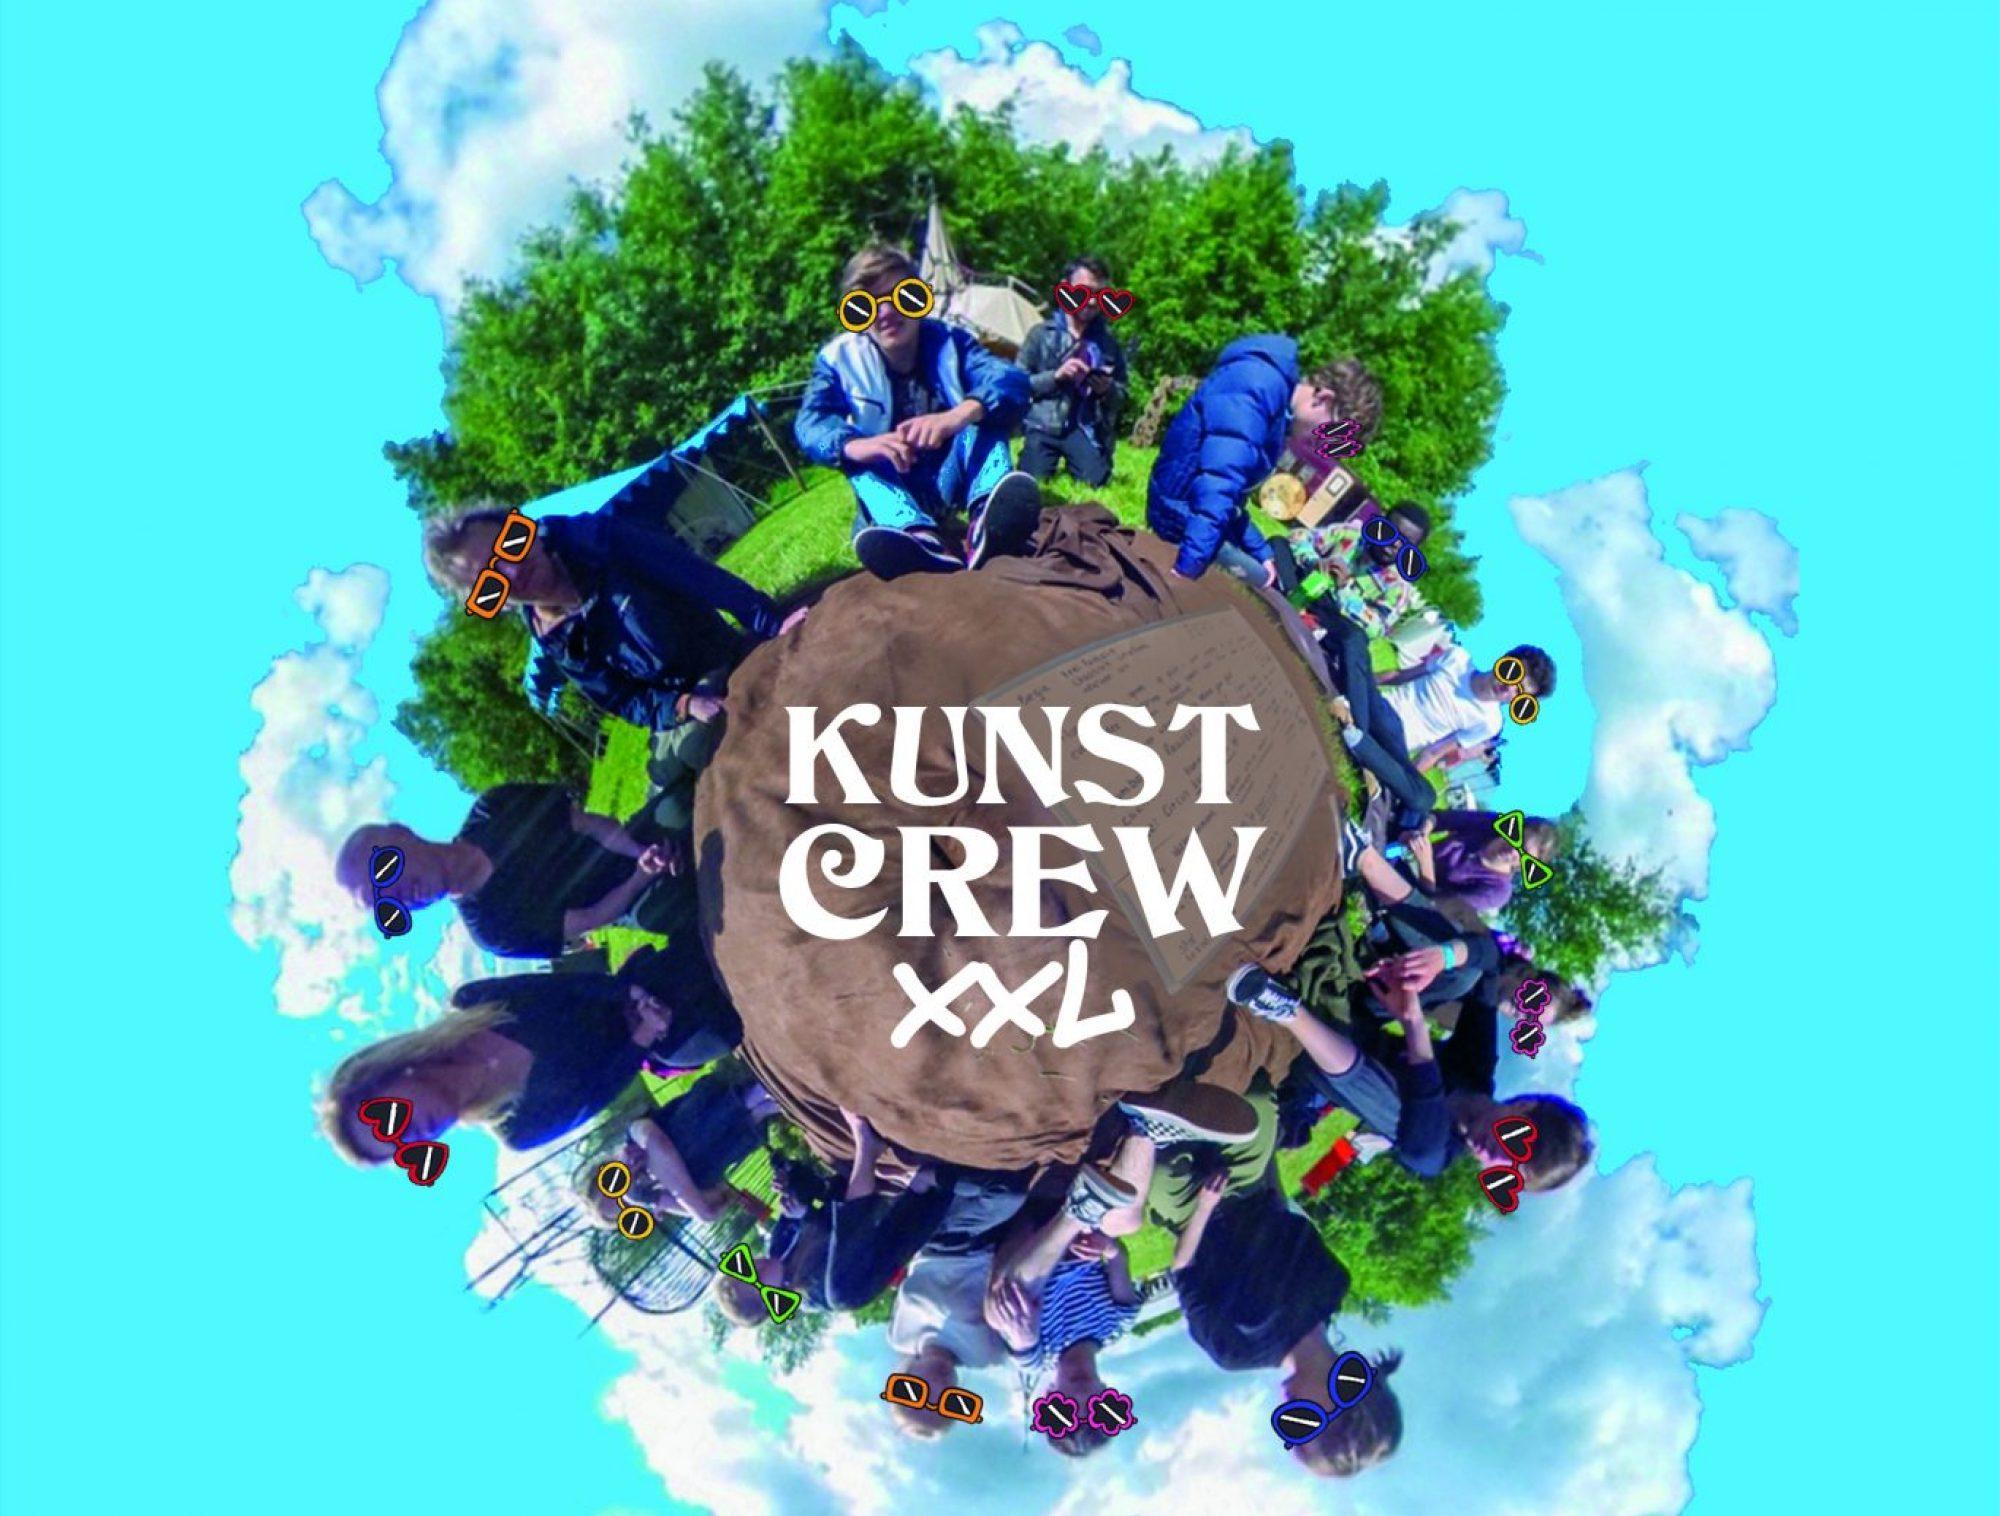 KunstCrewXXL